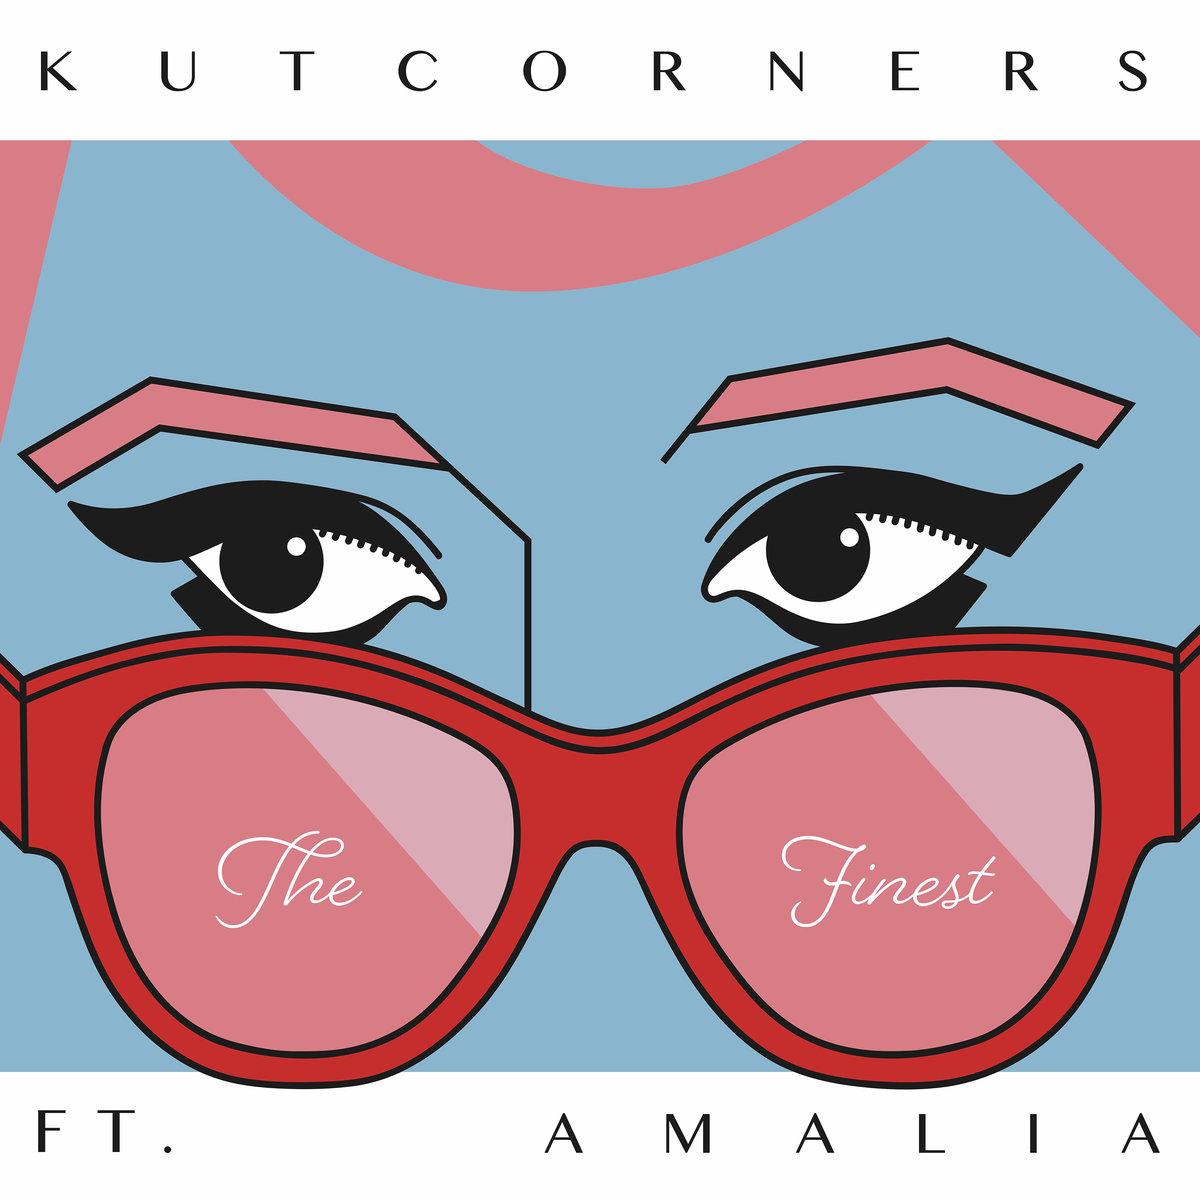 Kutcorners ft. Amalia - Potatohead People